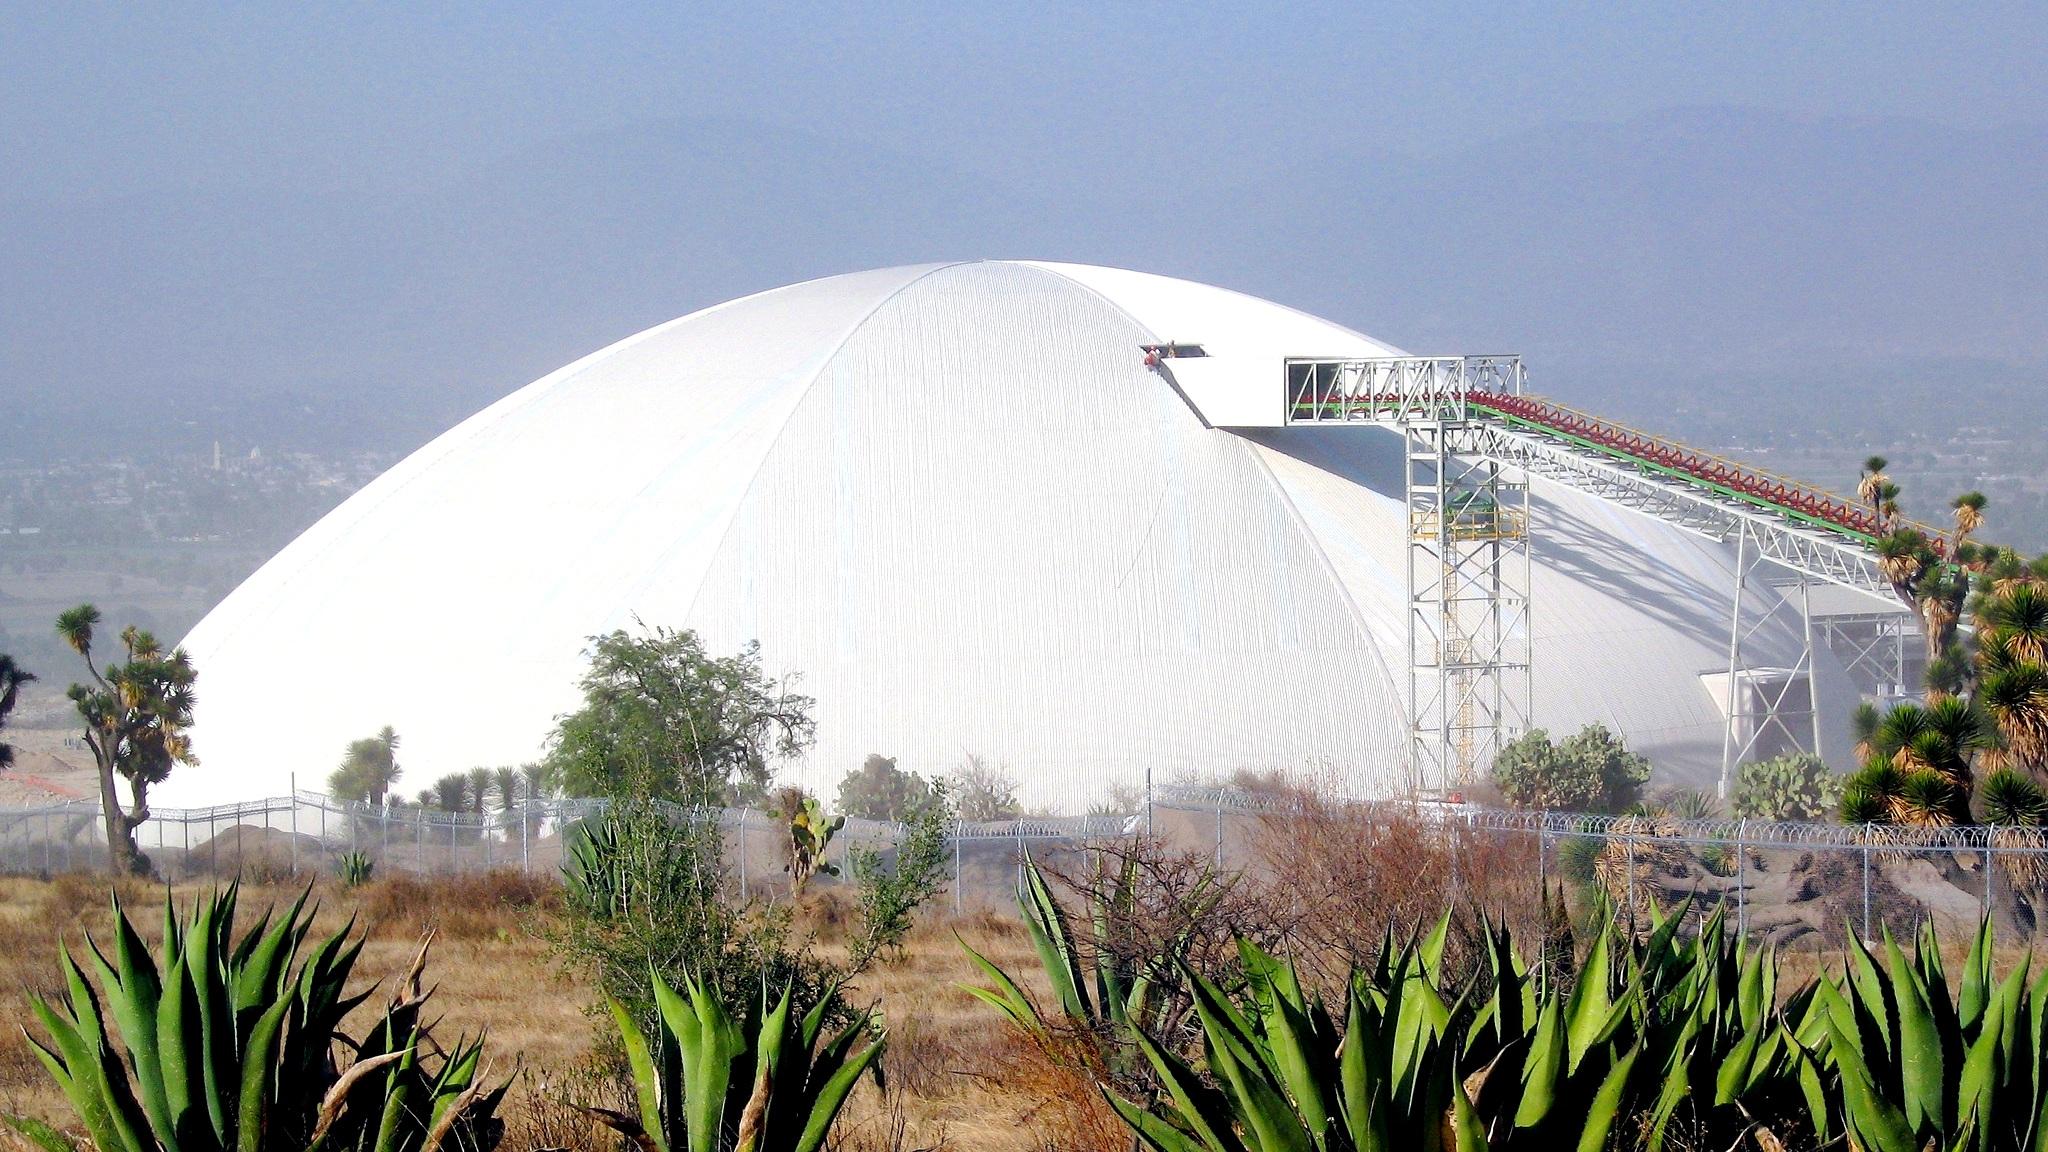 Un inmenso domo circular cubre una pila de anillo en la planta de Cementos Moctezuma en México.